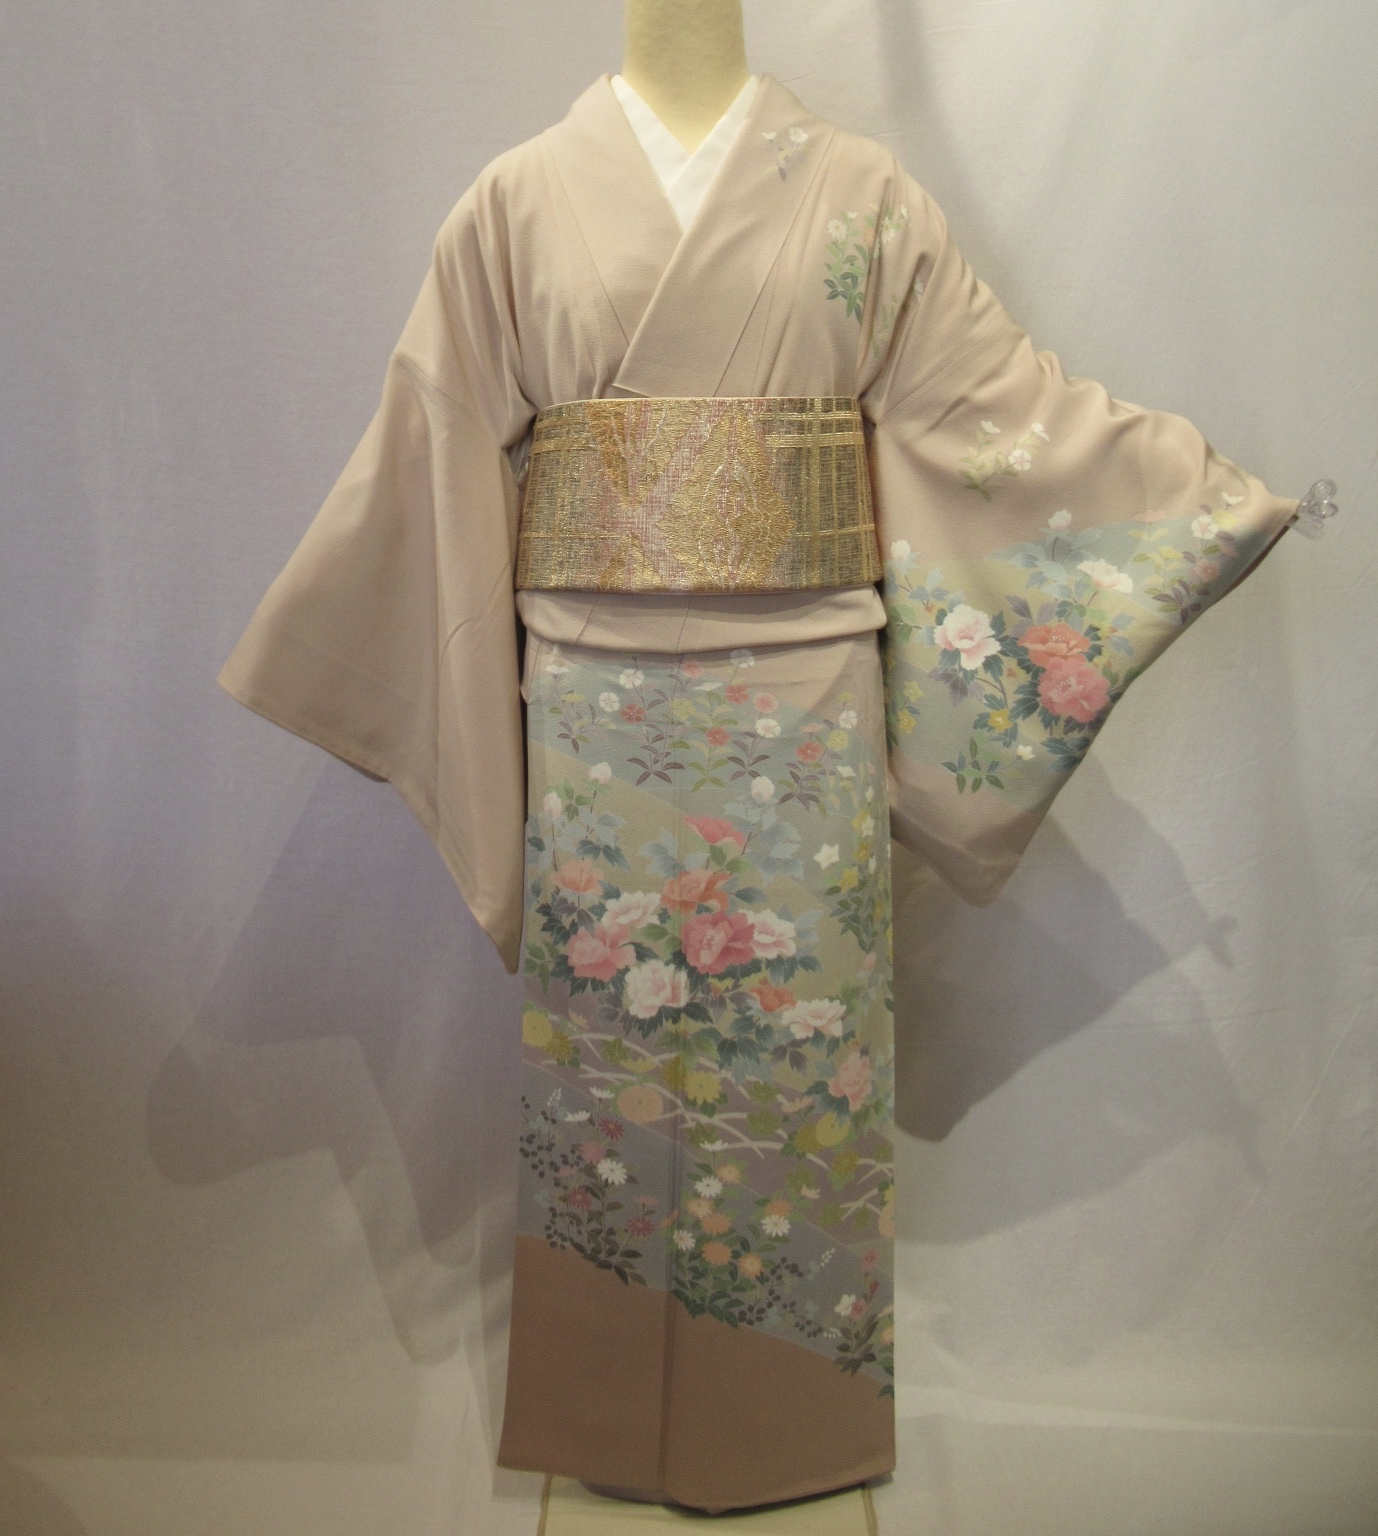 1955作家物加賀友禅訪問着と佐賀錦袋帯セット